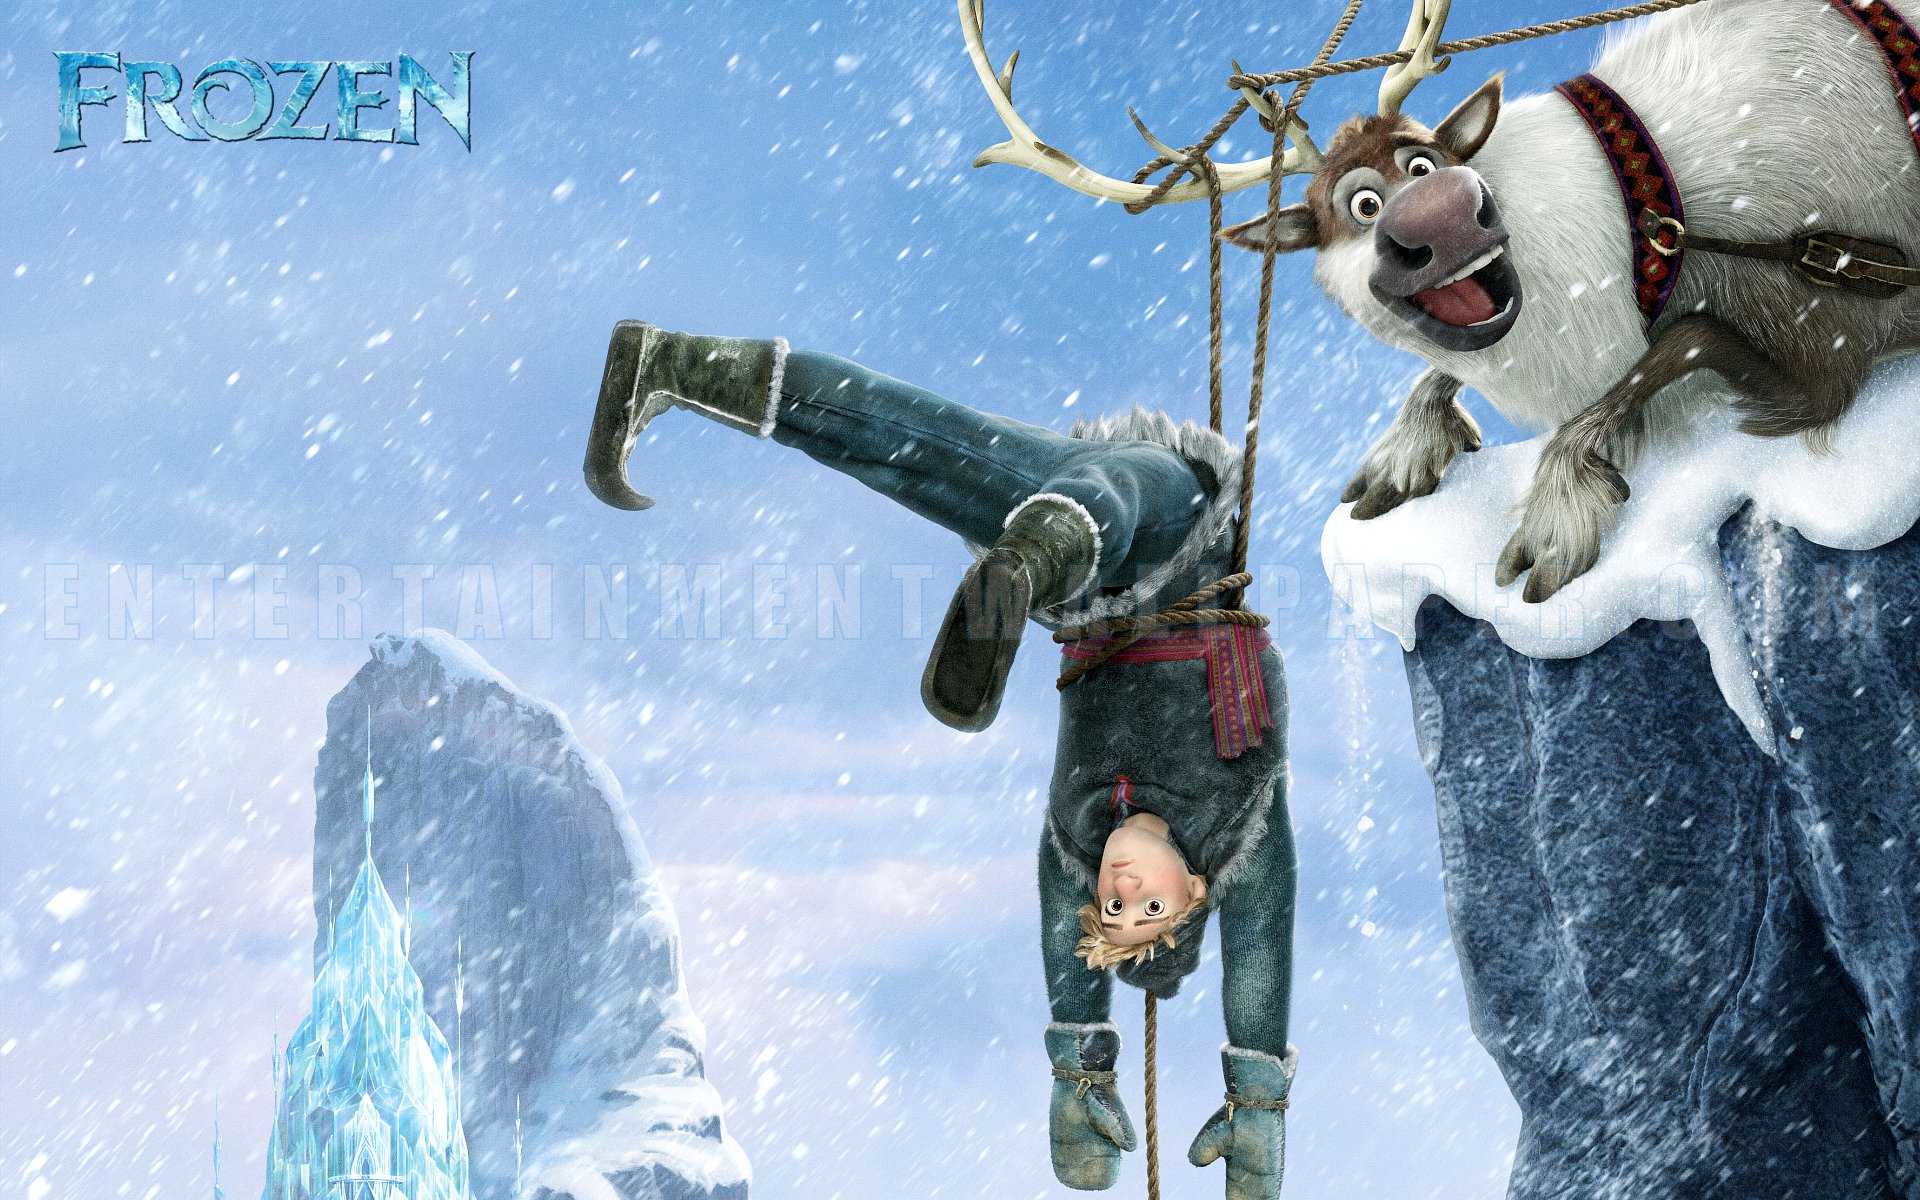 Frozen Frozen Wallpaper